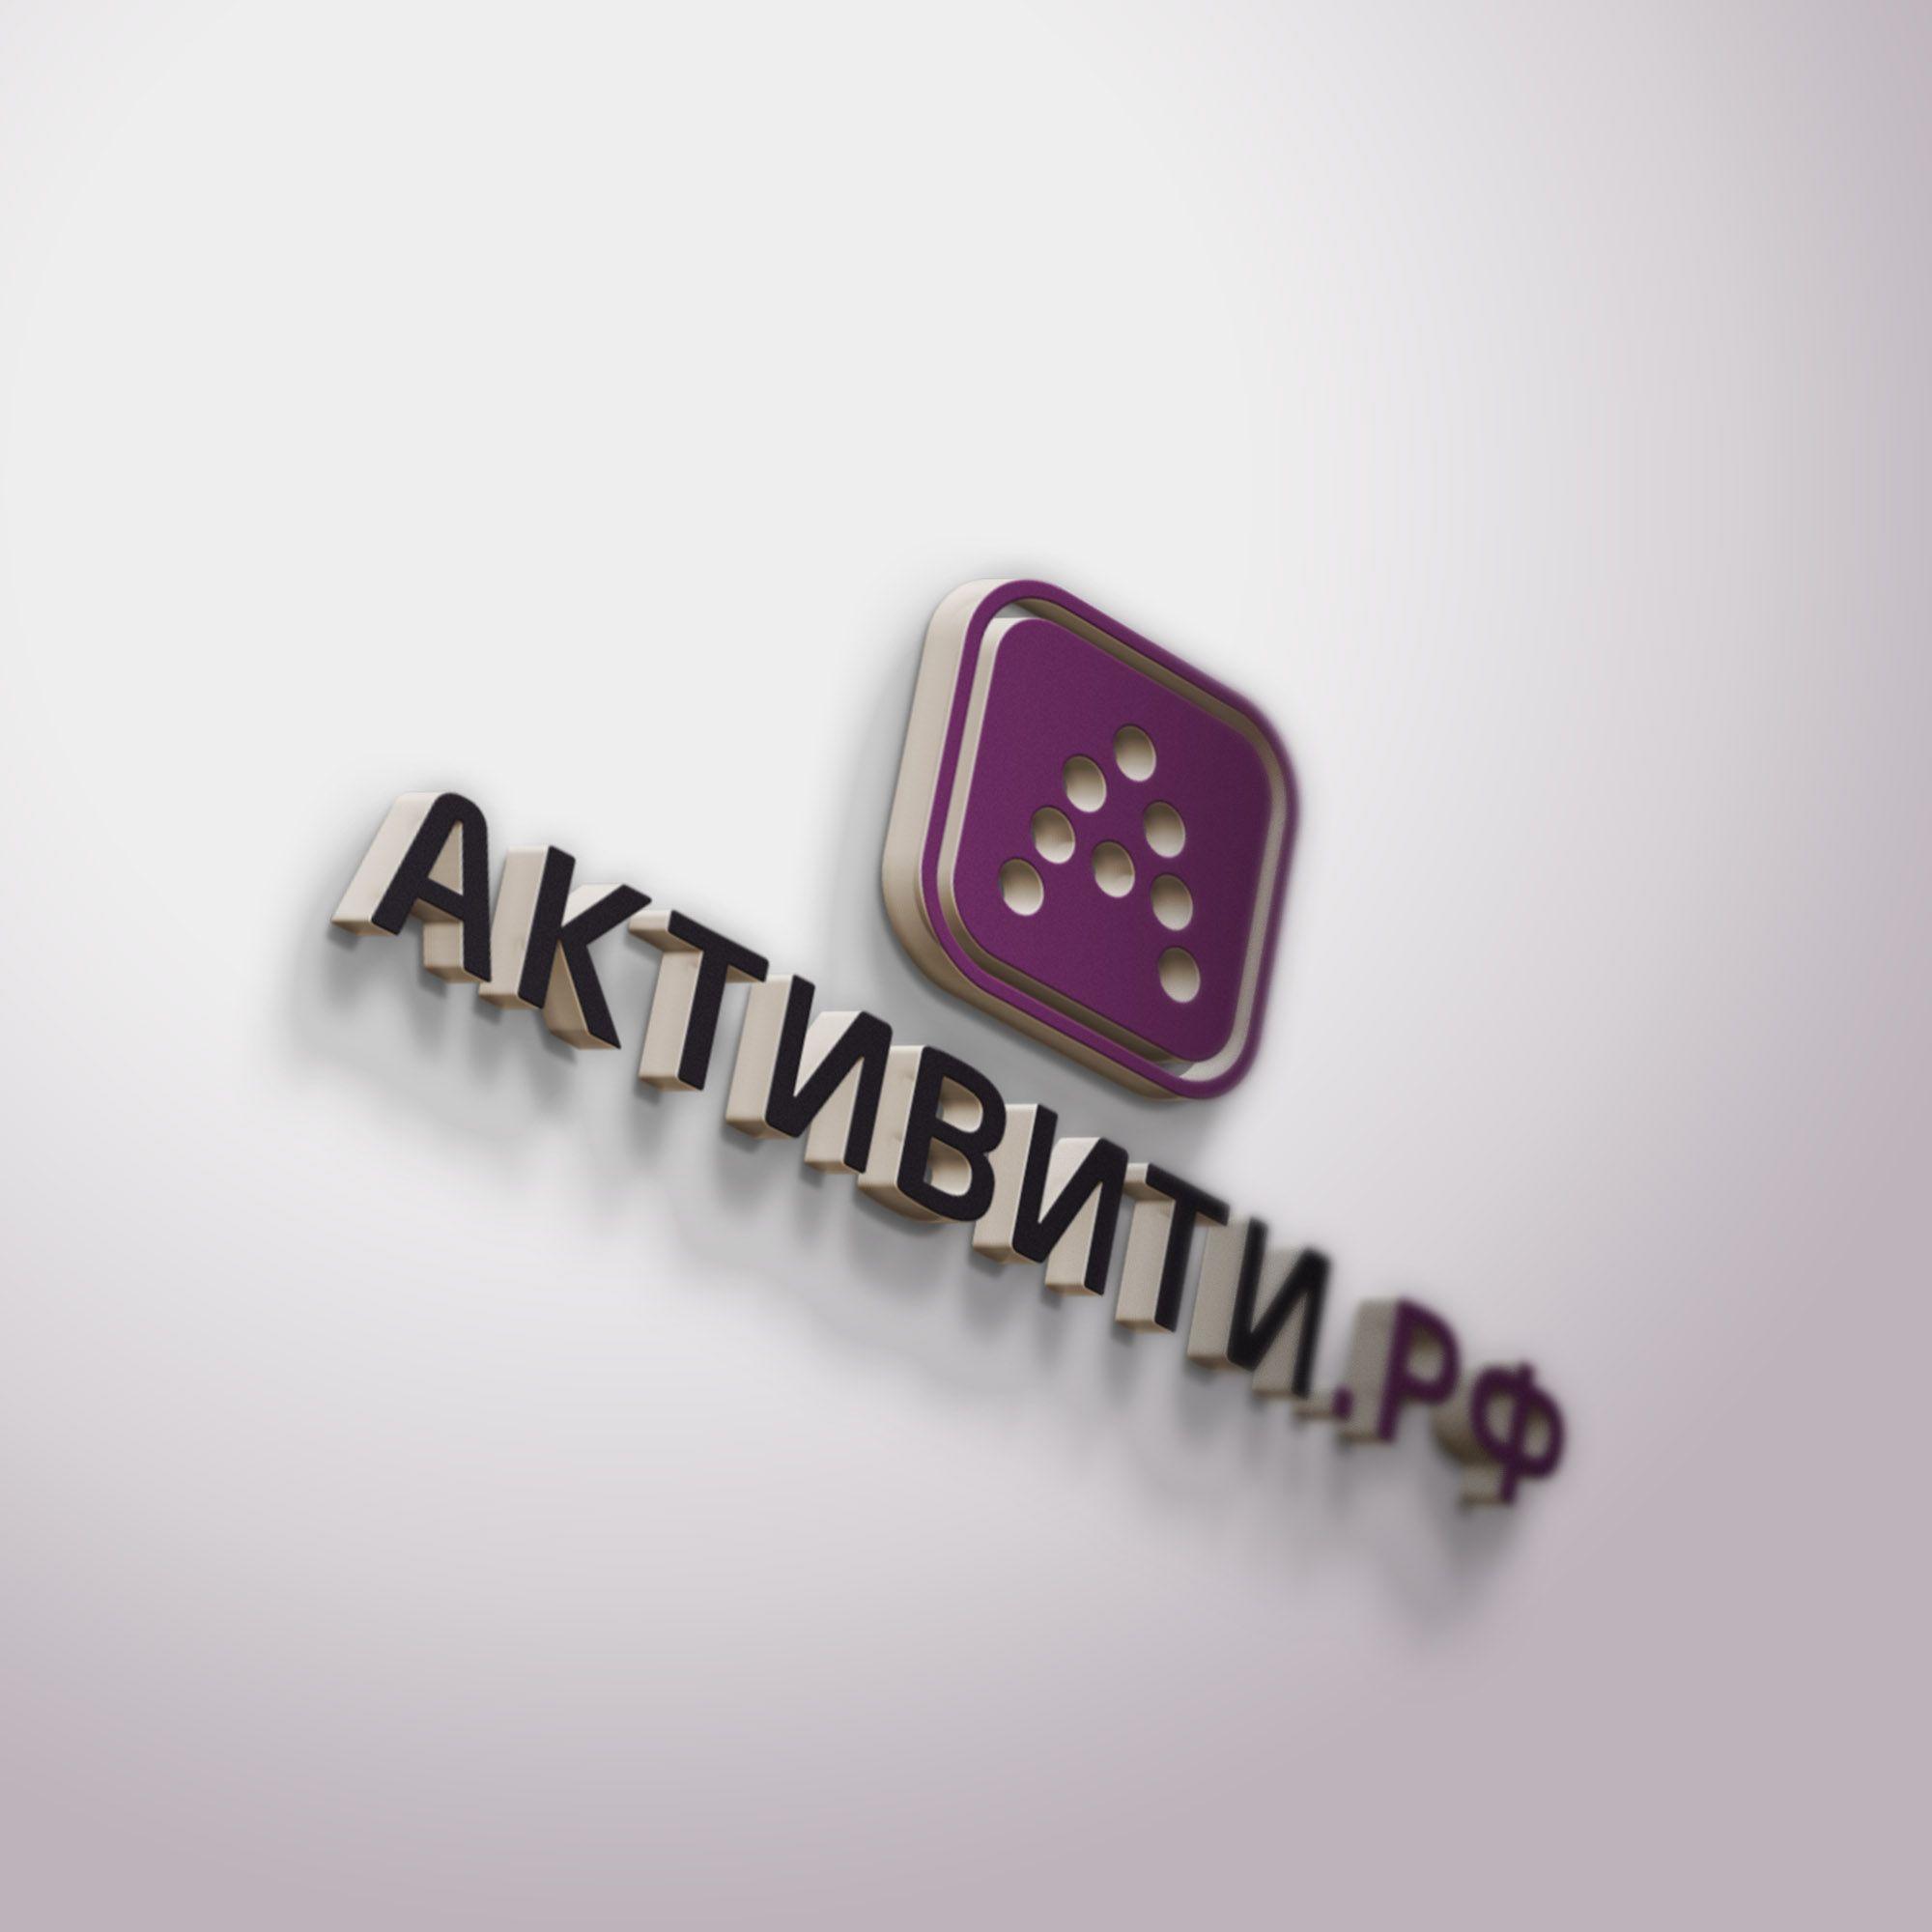 Логотип магазина активити.рф - дизайнер Lyuba13